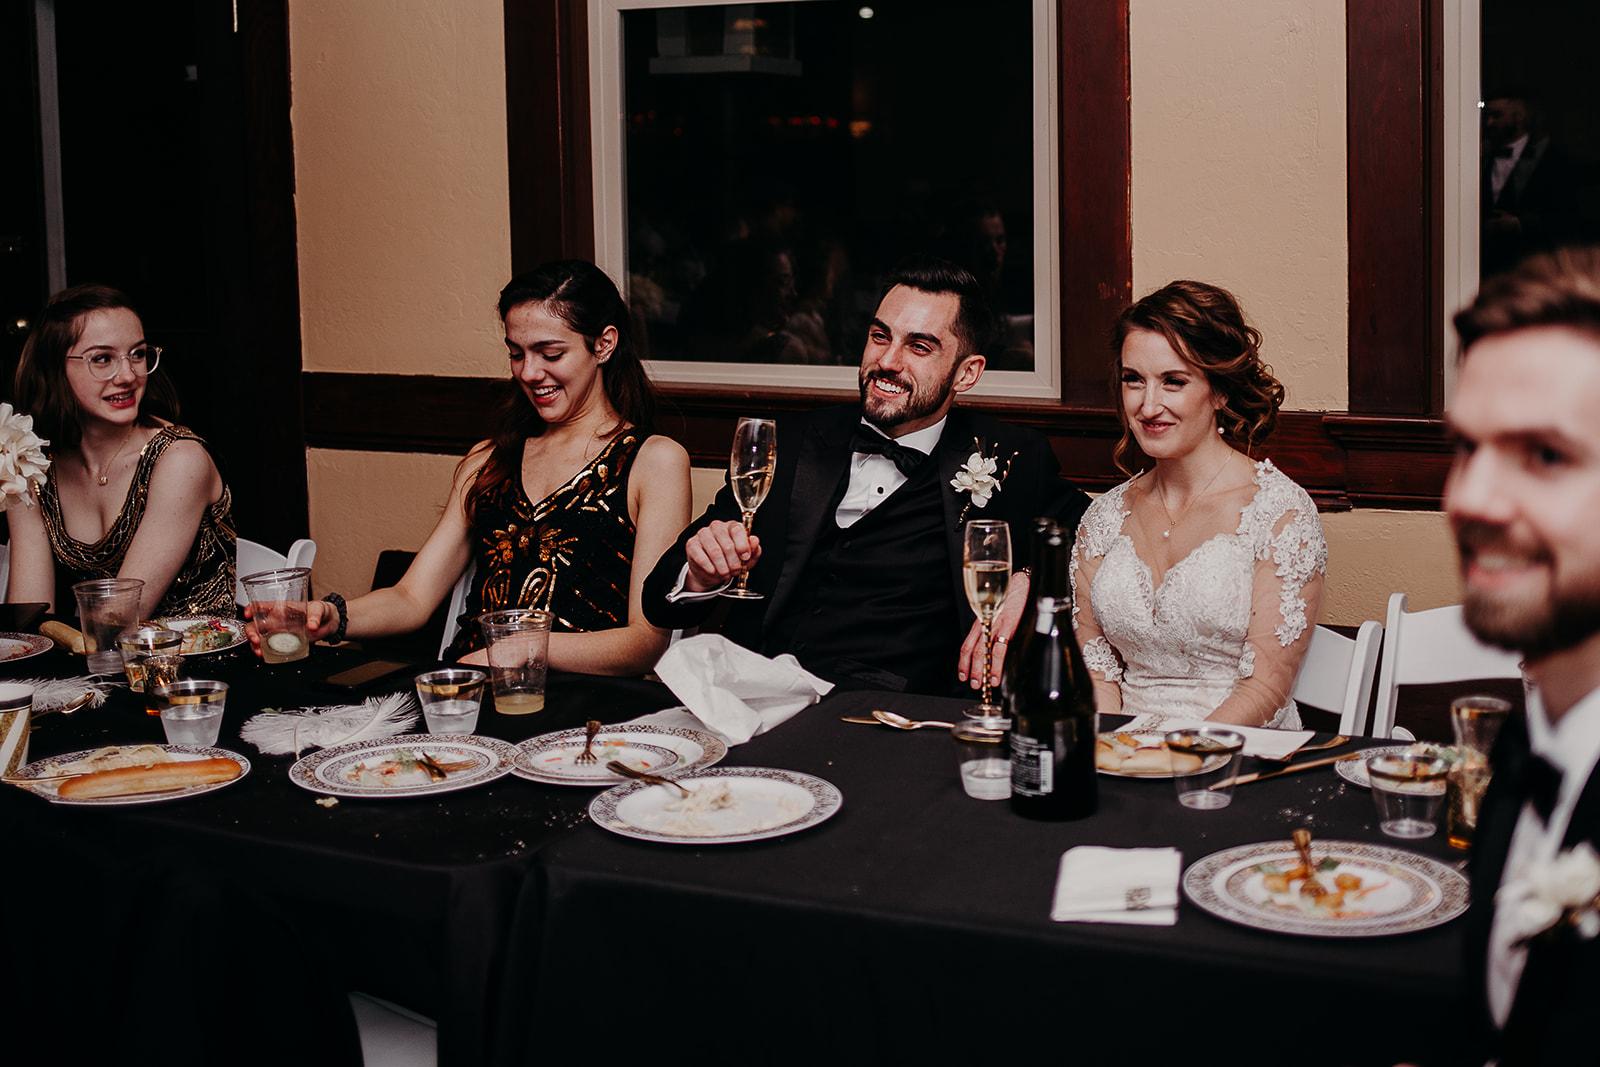 bellingham-wedding-broadway-hall-natalie-levi-reception (68 of 120).jpg